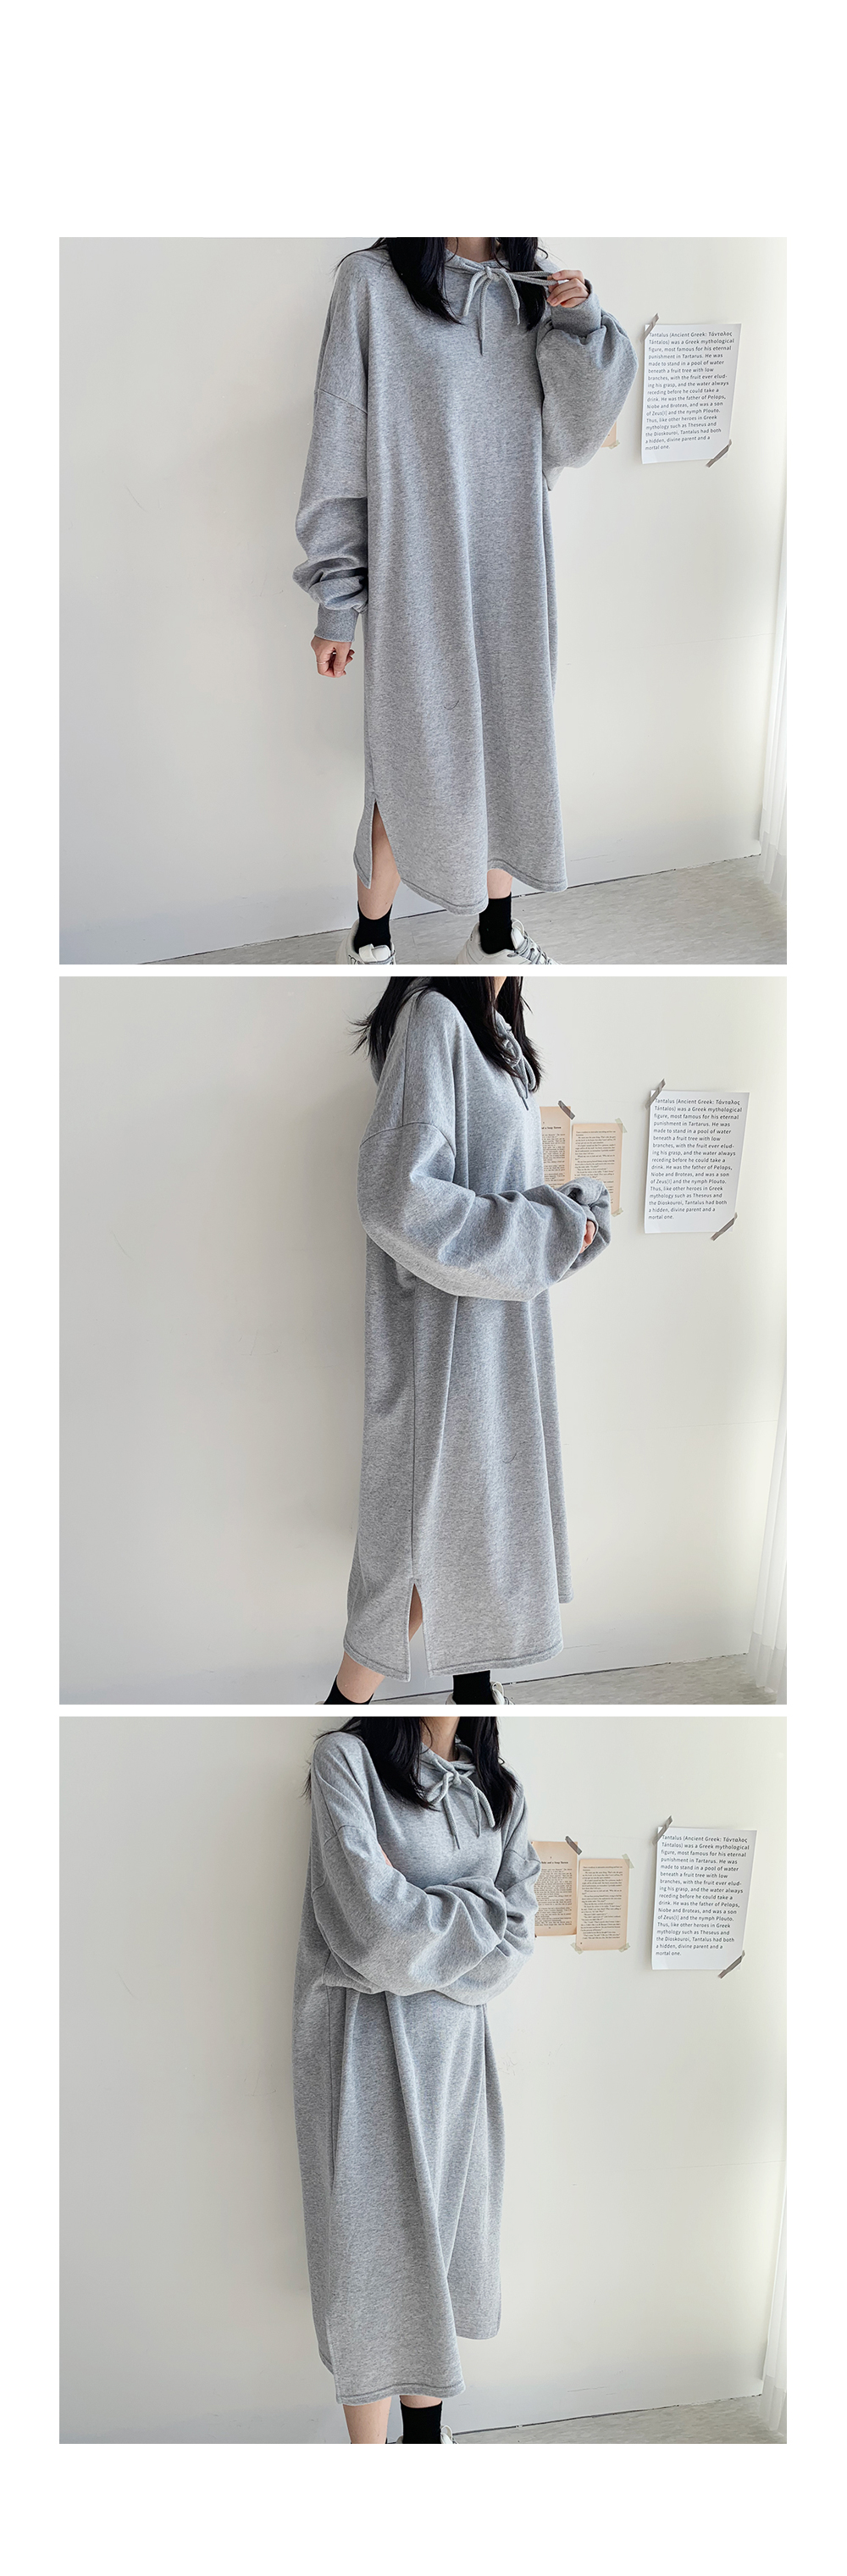 Long Hooded Im Dress